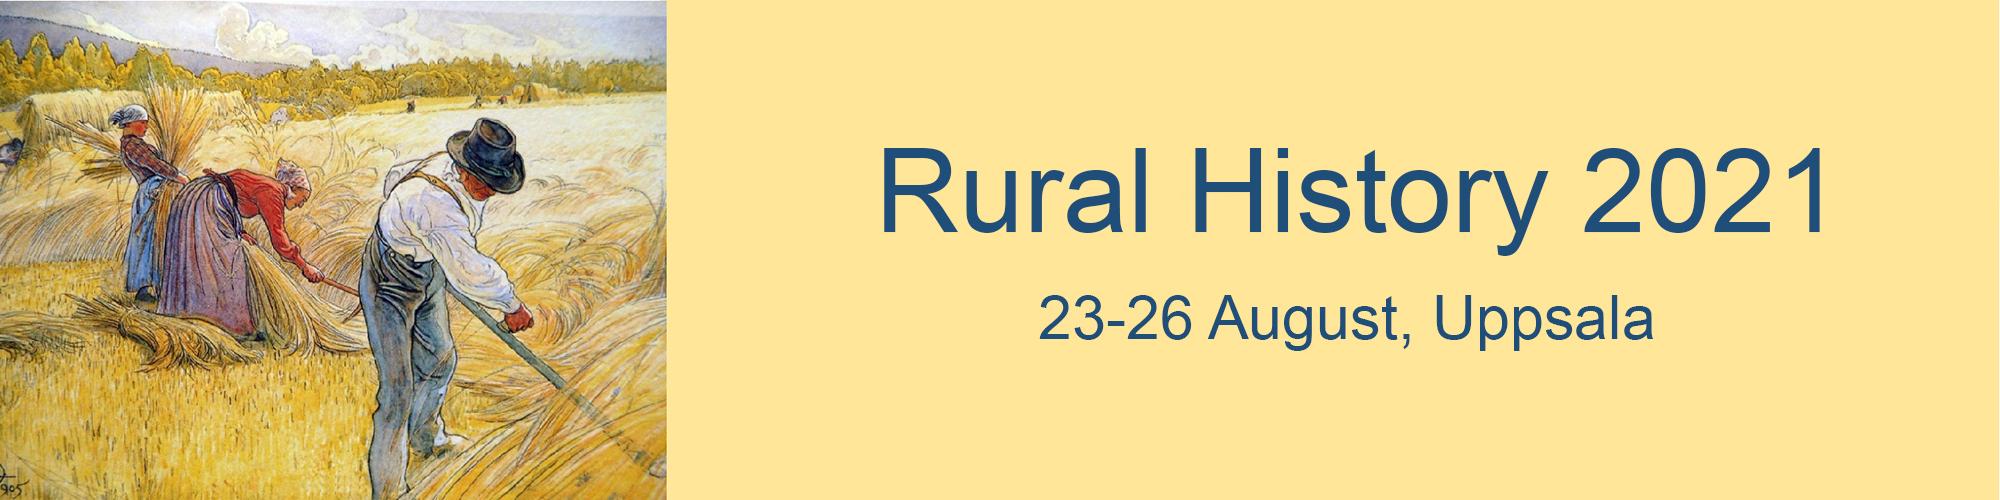 Rural History. Banner.